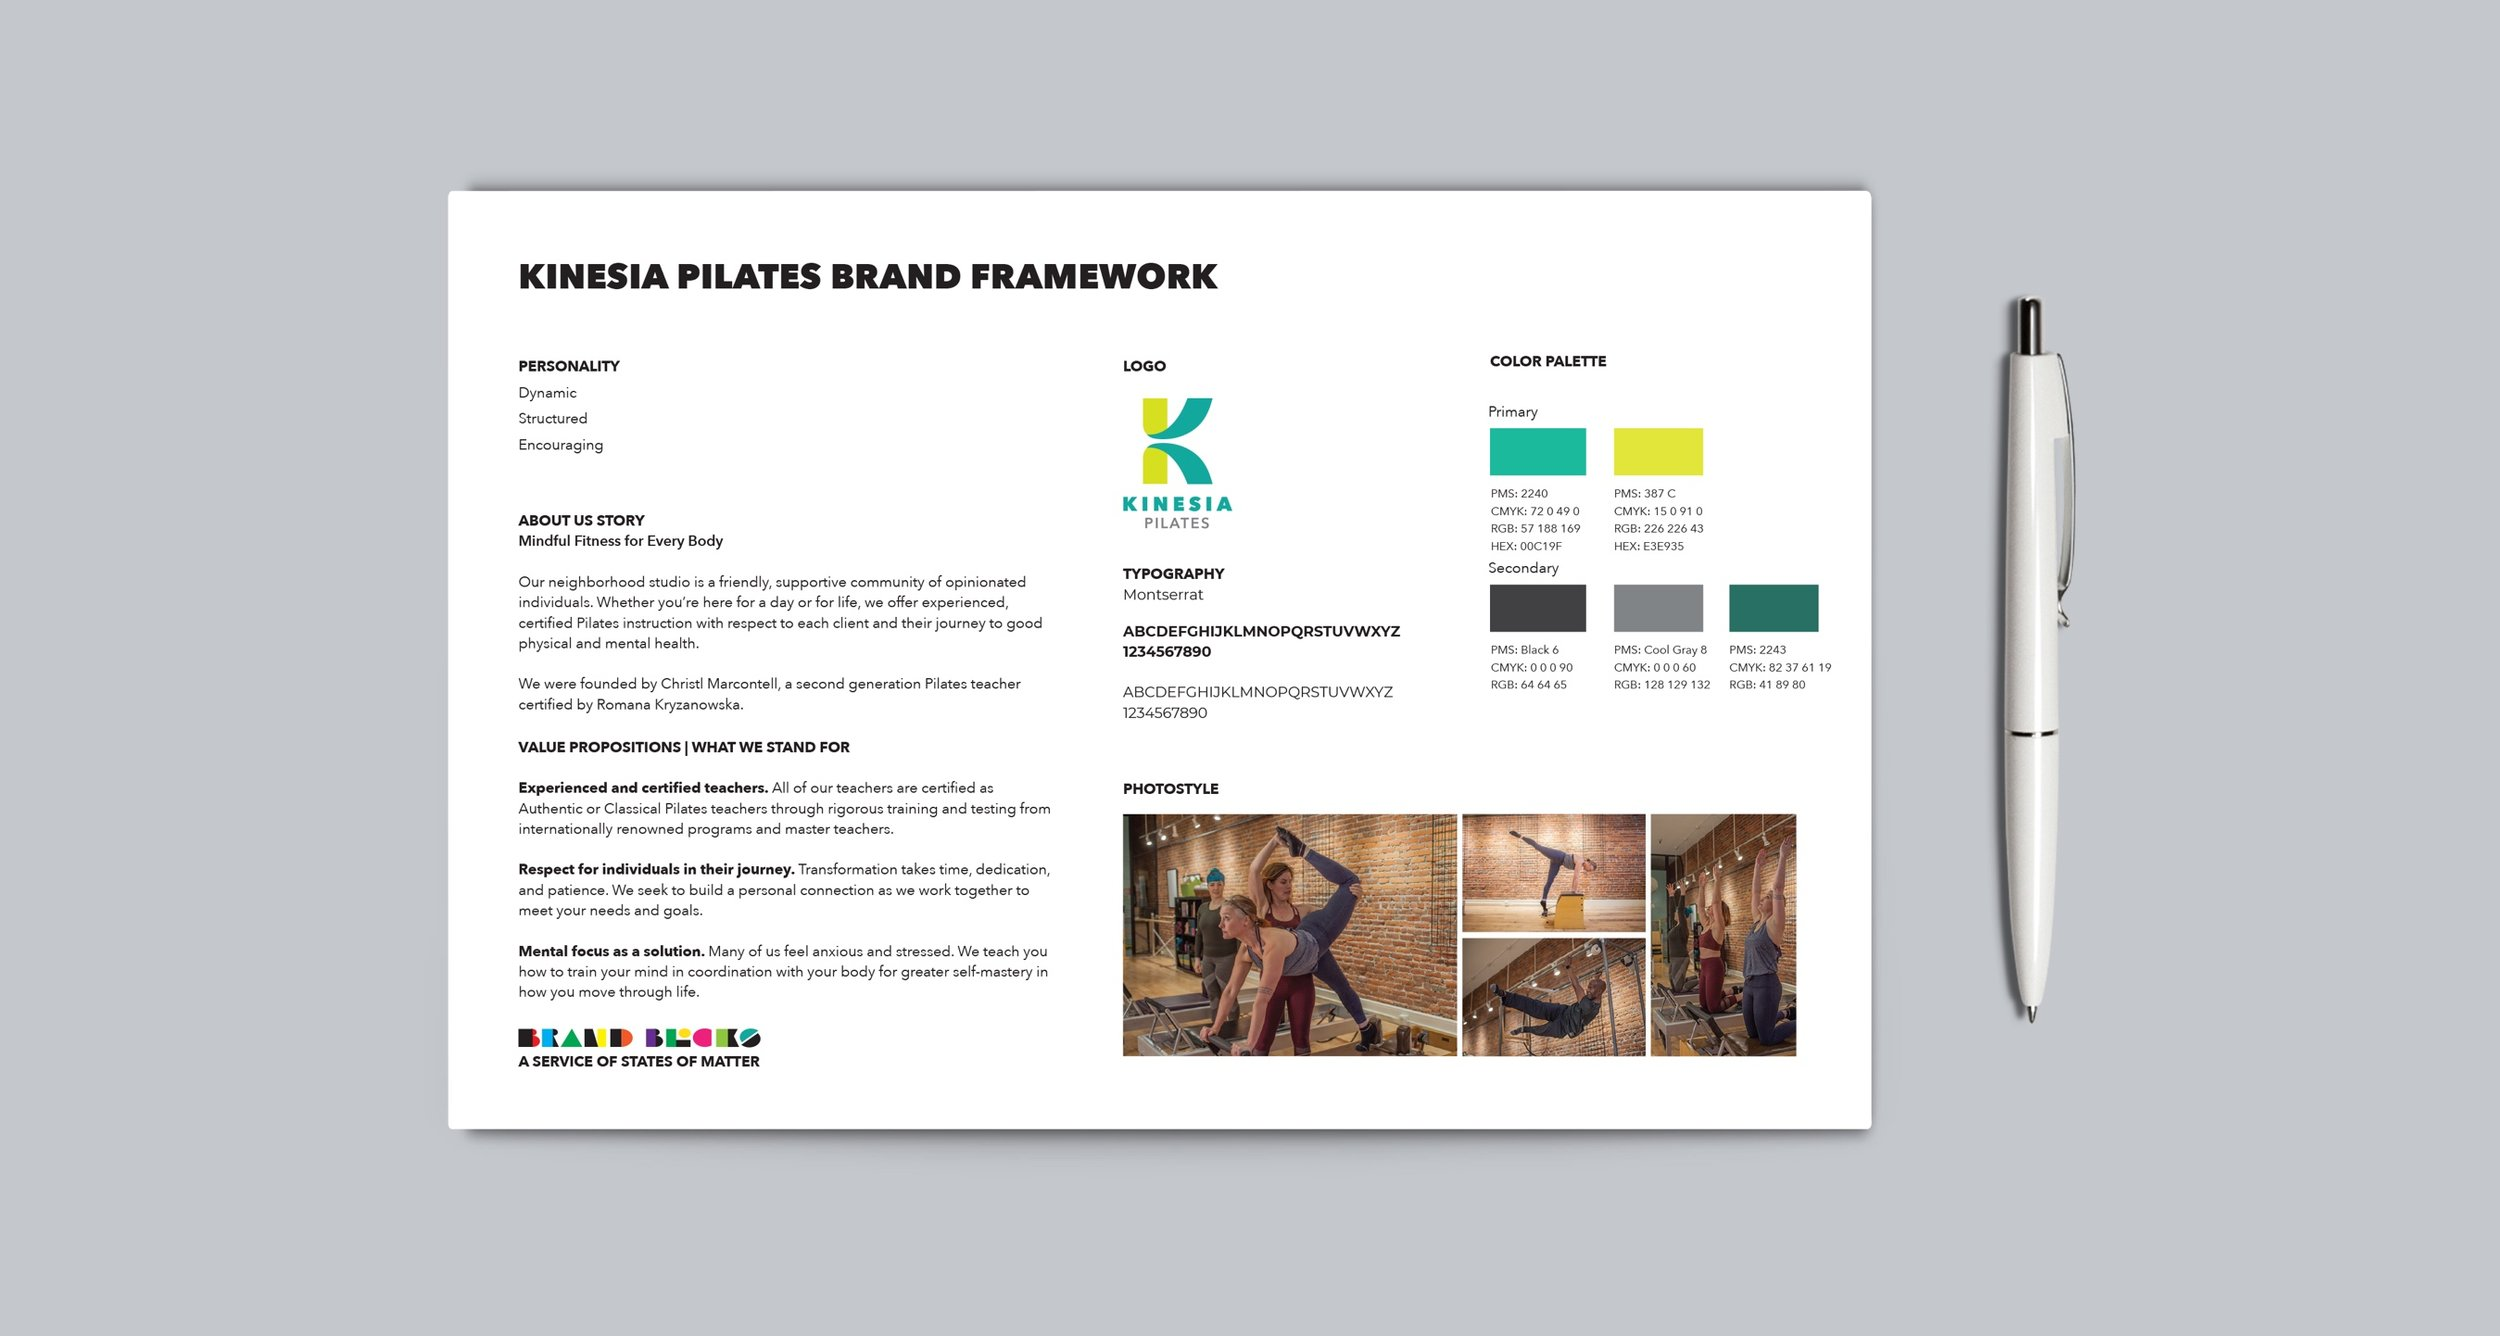 kinesia_brand_guidelines@2x.jpg